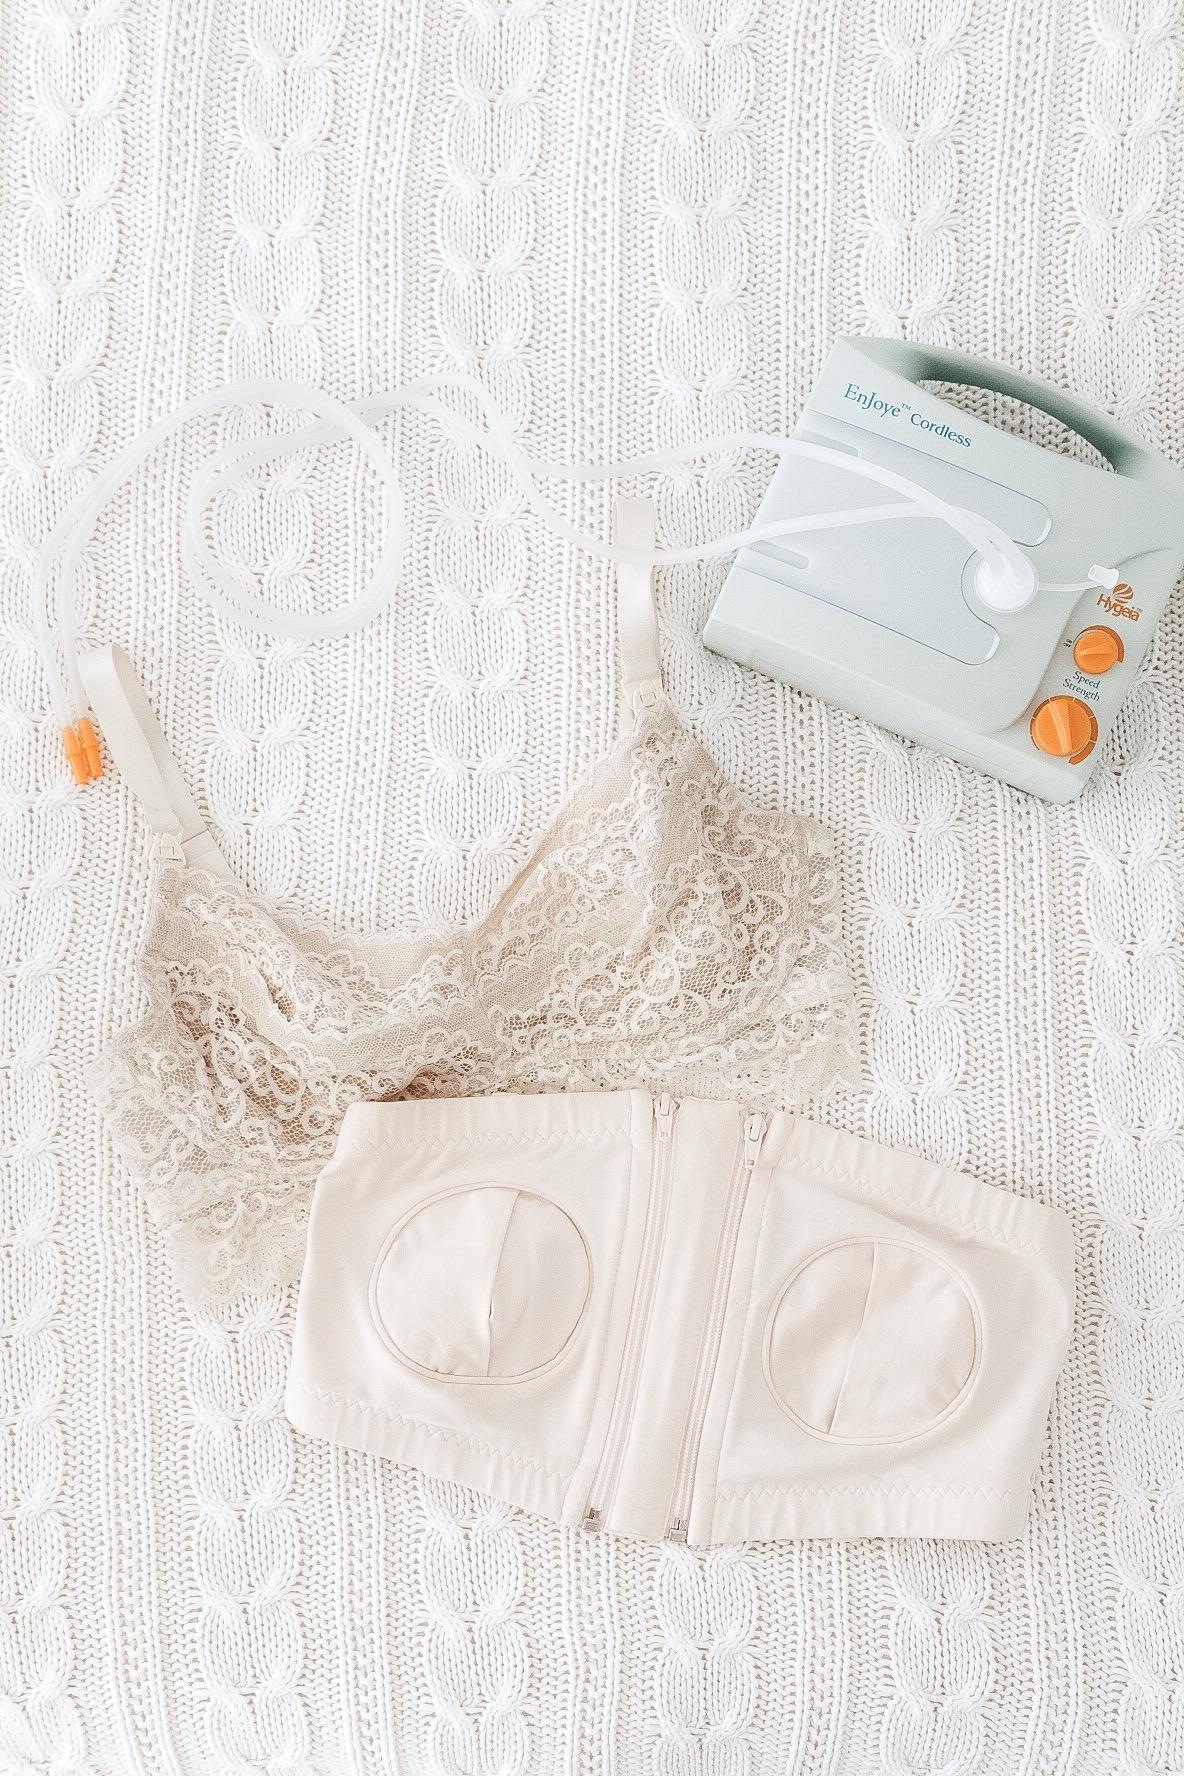 Best nursing bras for pumping.  Nursing bra you can wear to work.